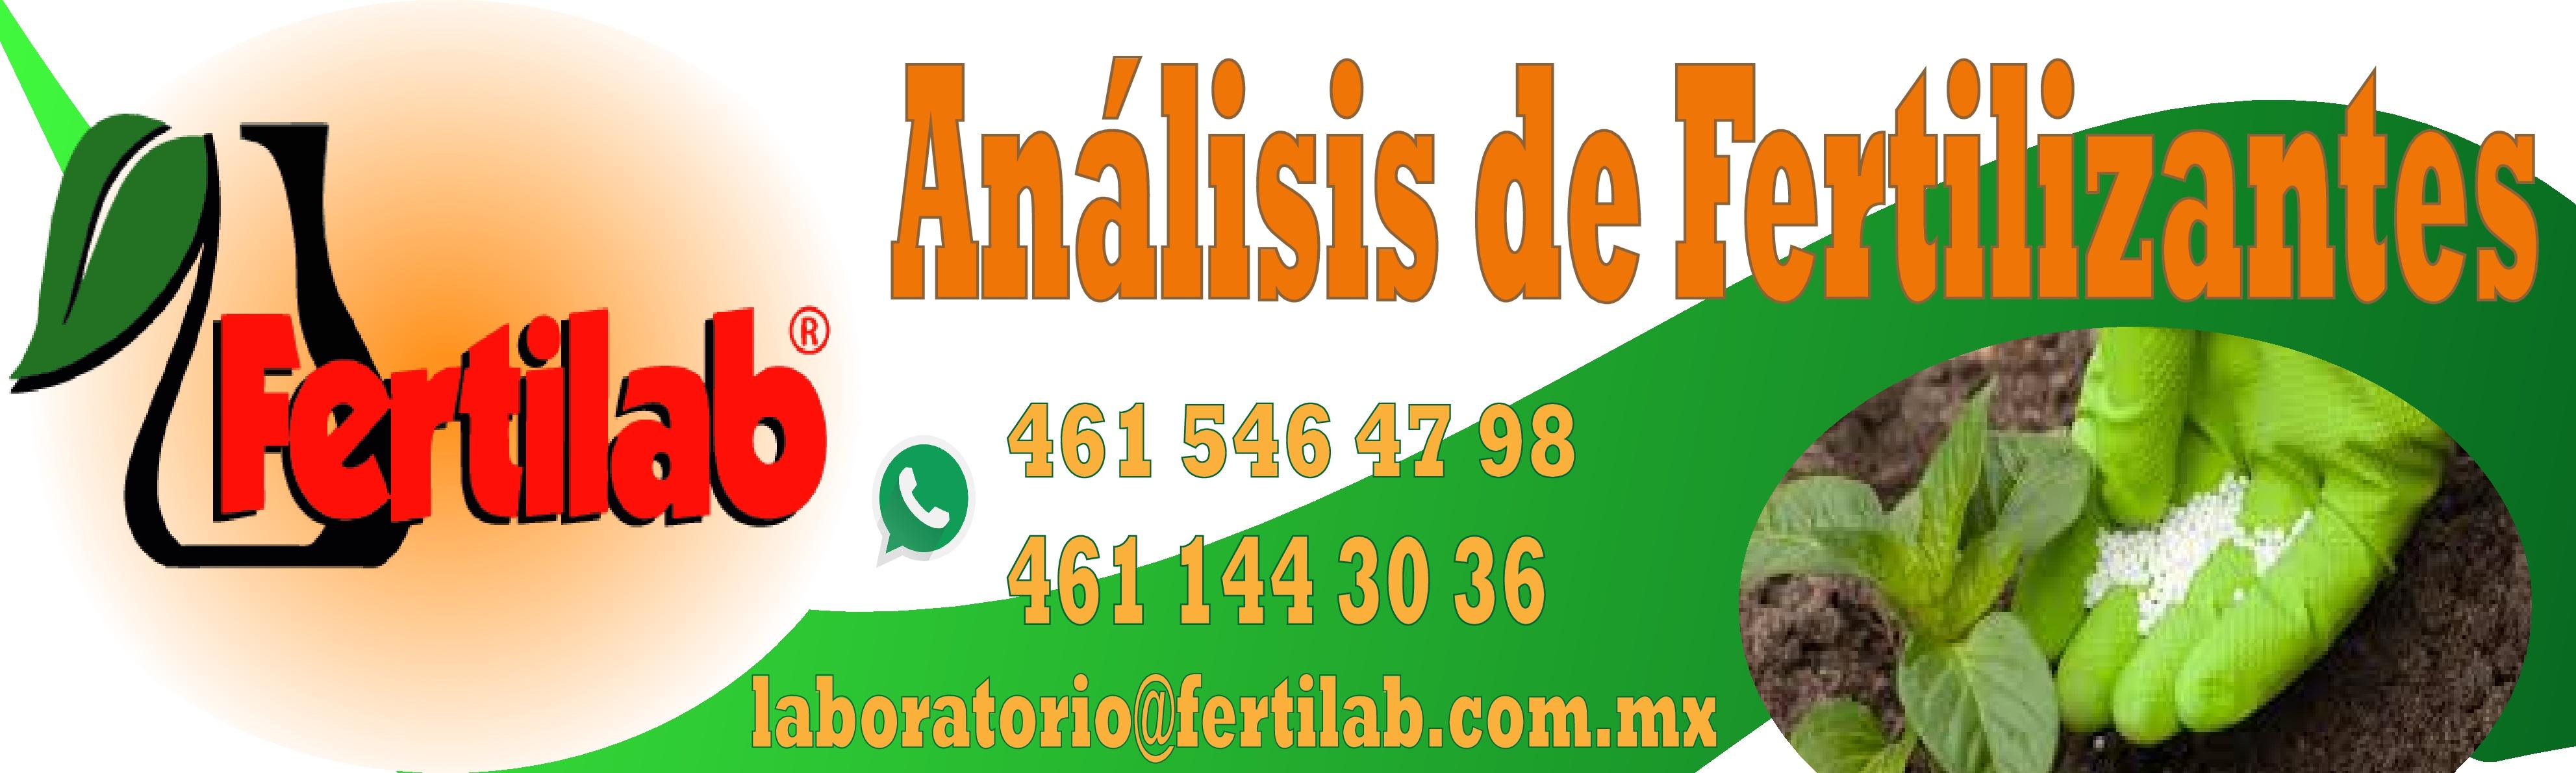 Analisis de fertilizantes